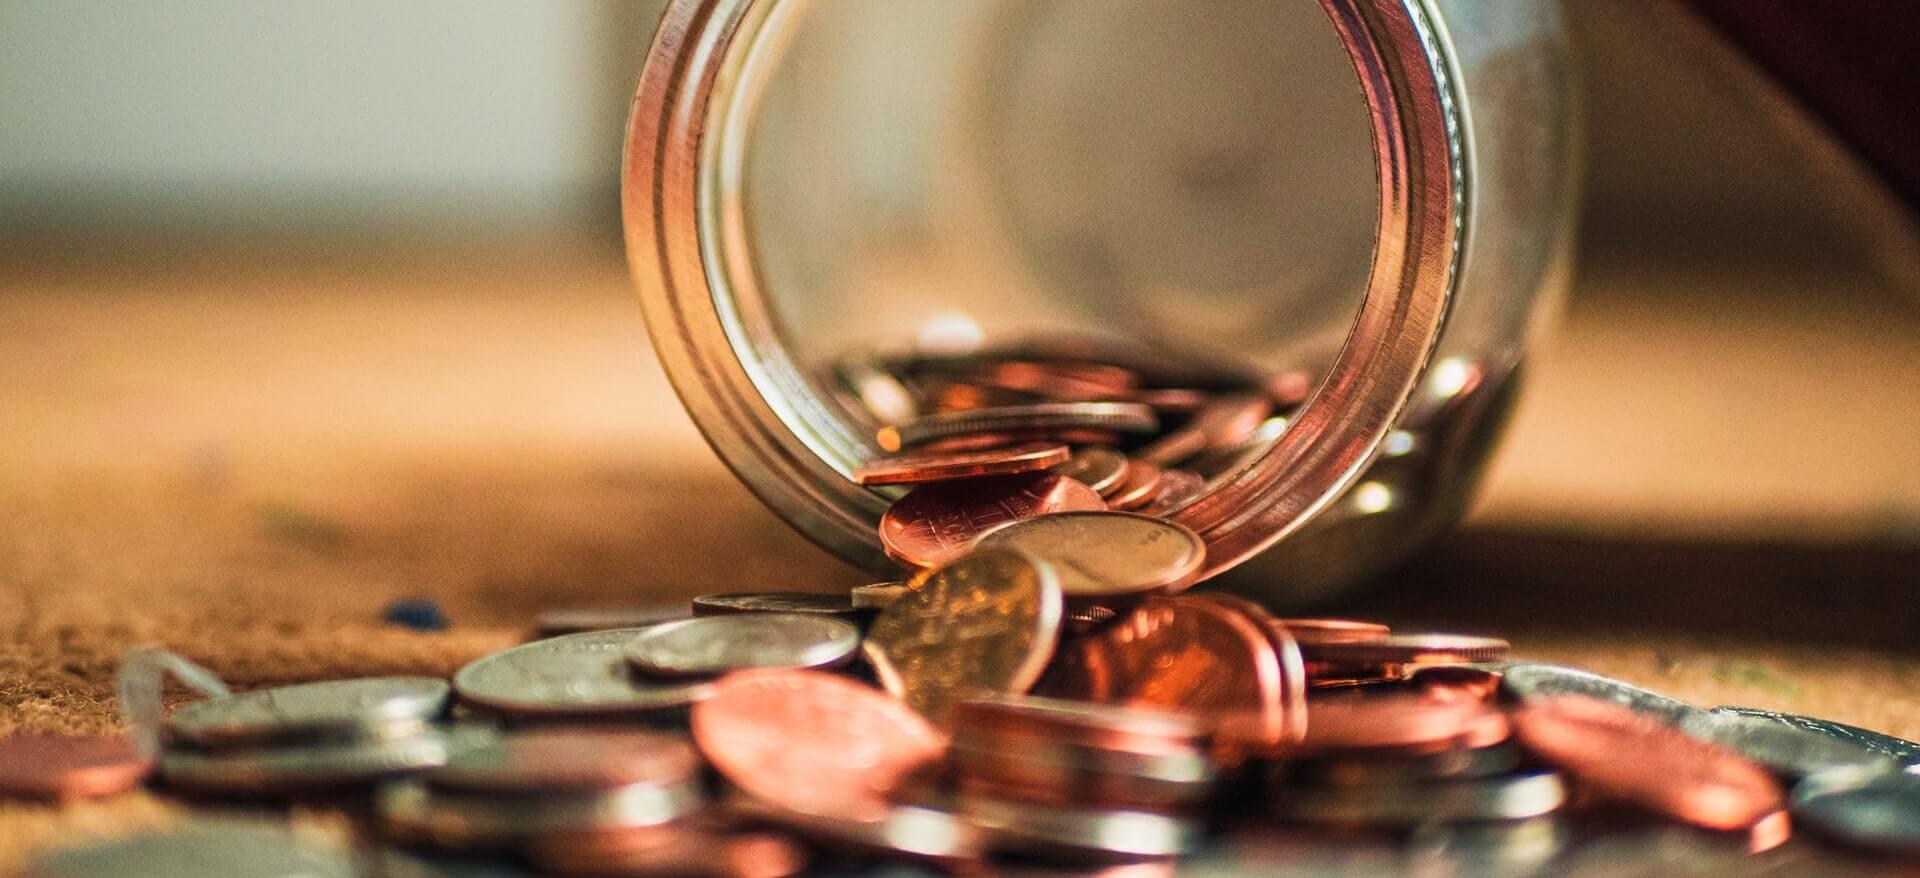 website-kosten-sparen